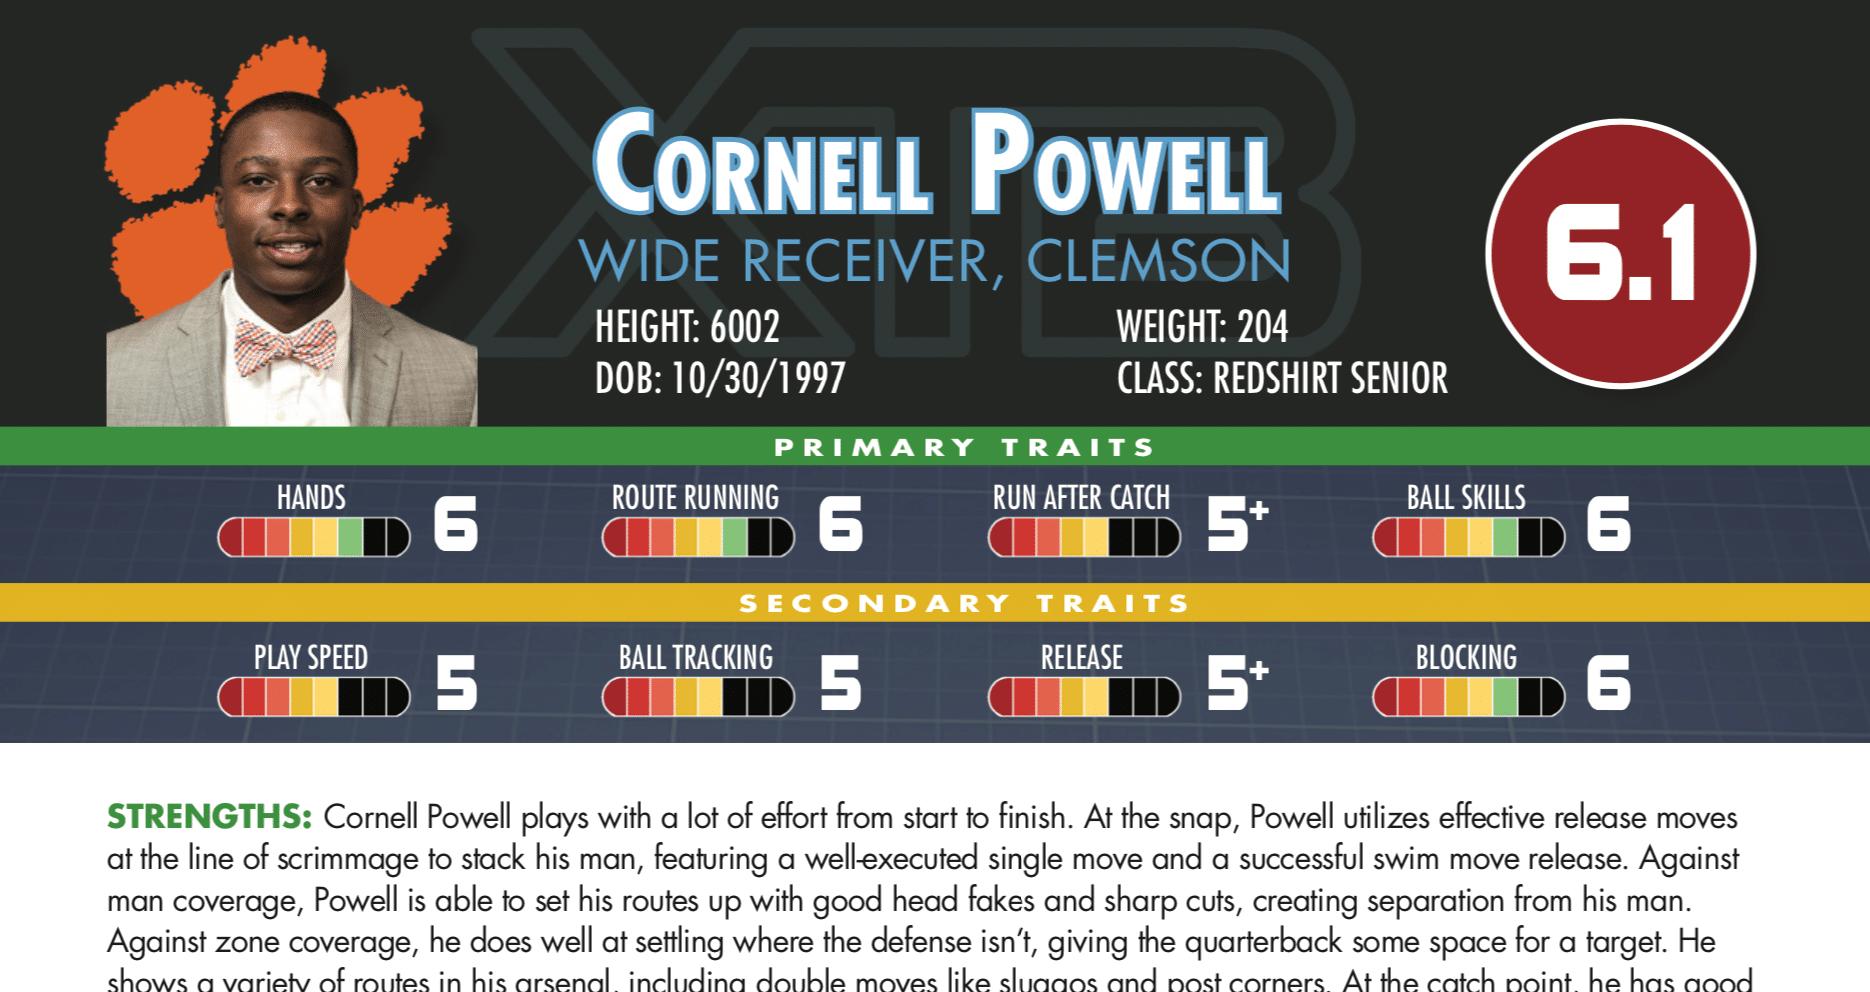 Cornell Powell